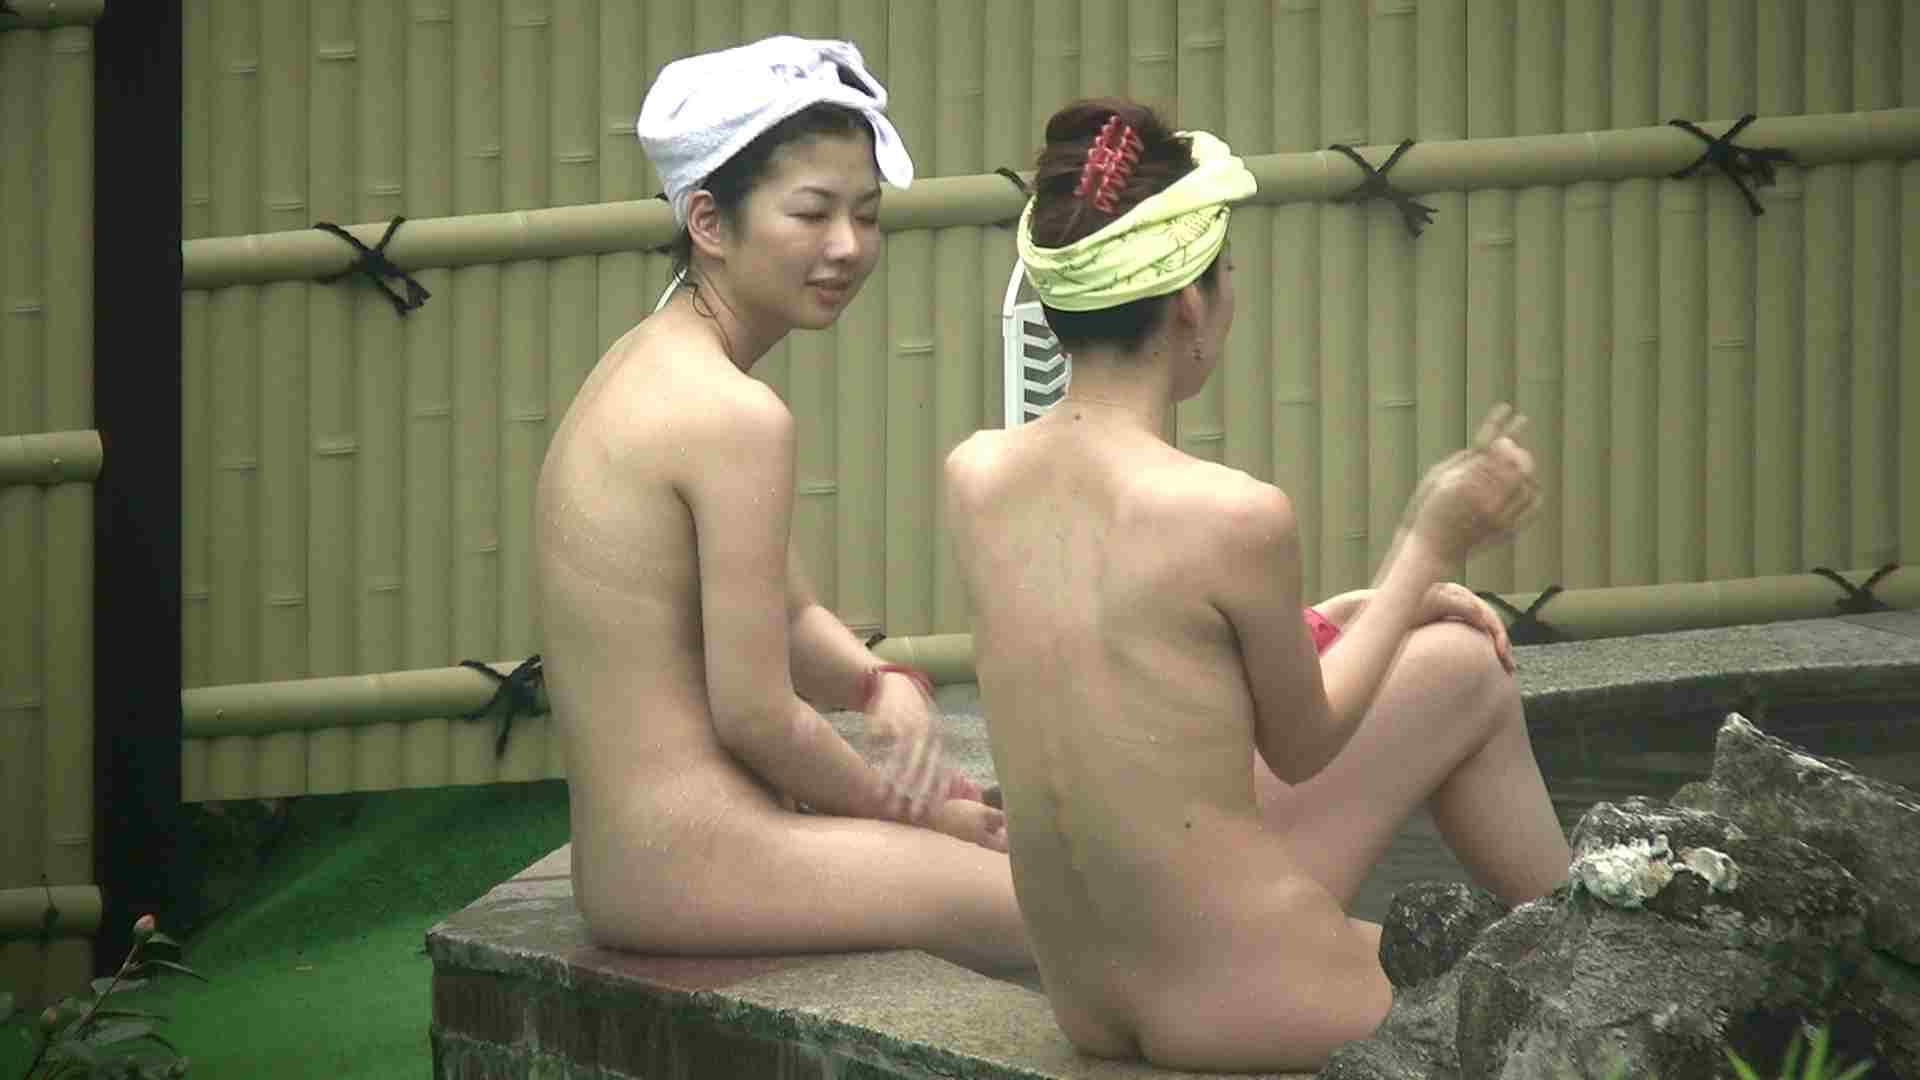 Aquaな露天風呂Vol.192 美しいOLの裸体 えろ無修正画像 101pic 62